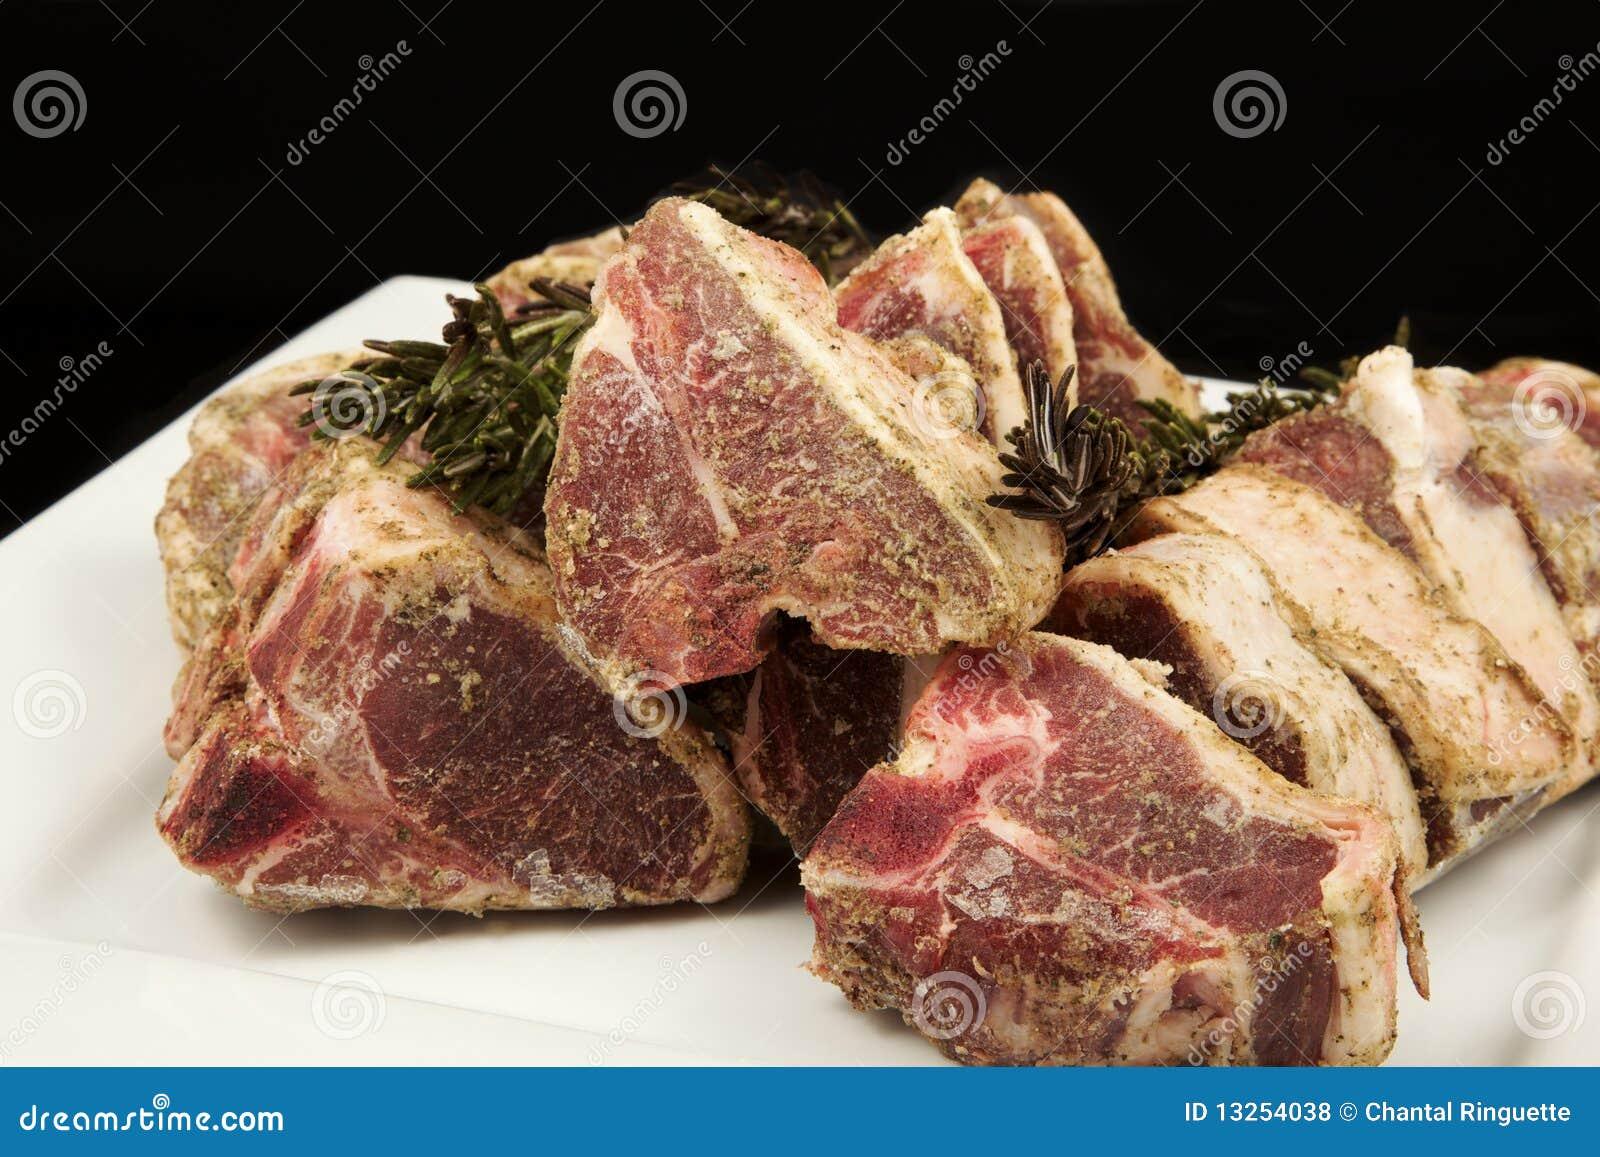 Frozen Pork Chops In The Instant Pot Pressure Cooker - YouTube |Frozen Lamb Chops